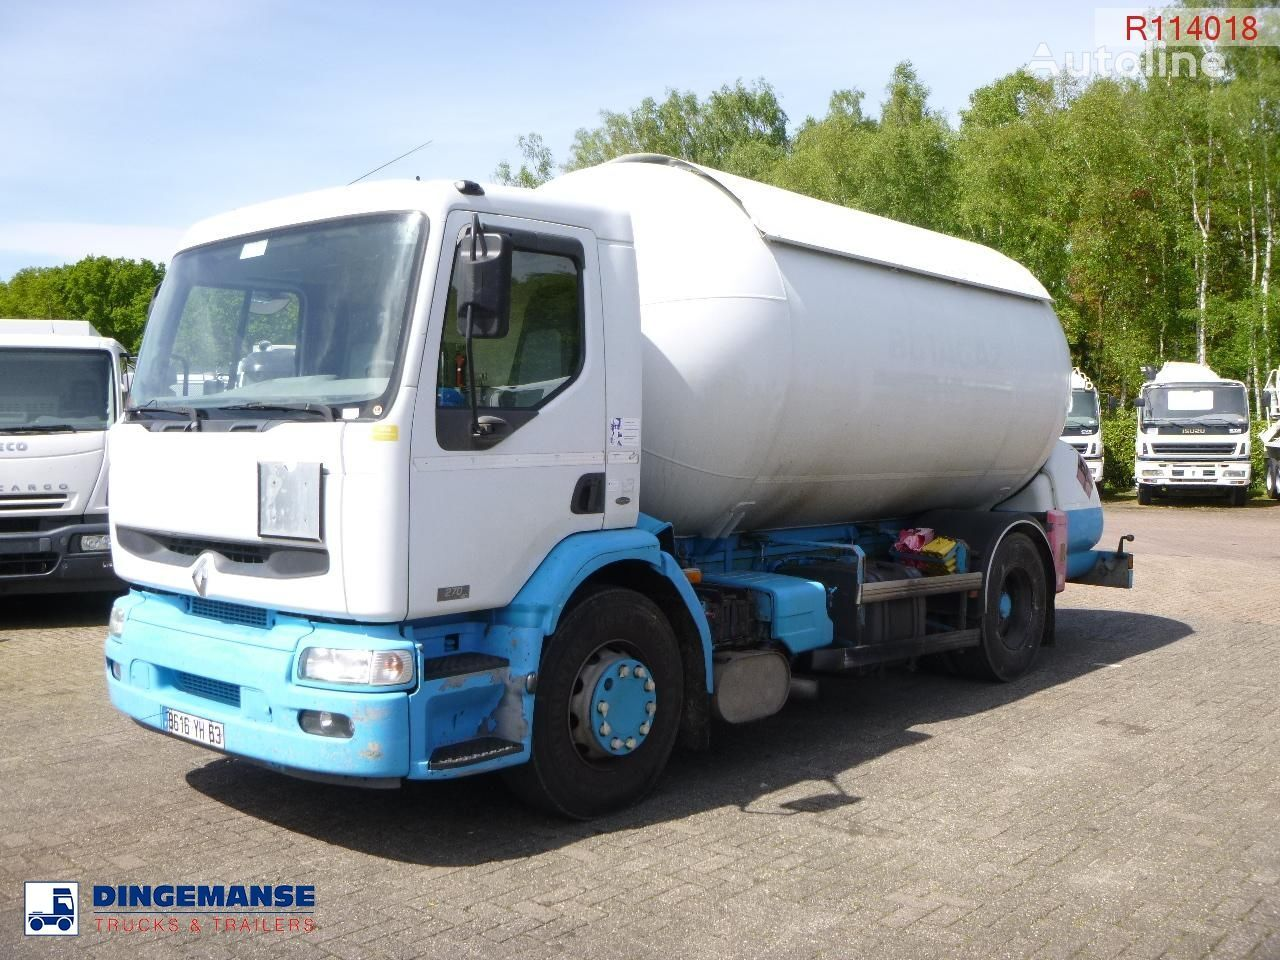 камион газовоз RENAULT Premium 270.19 4x2 gas tank 19.7 m3